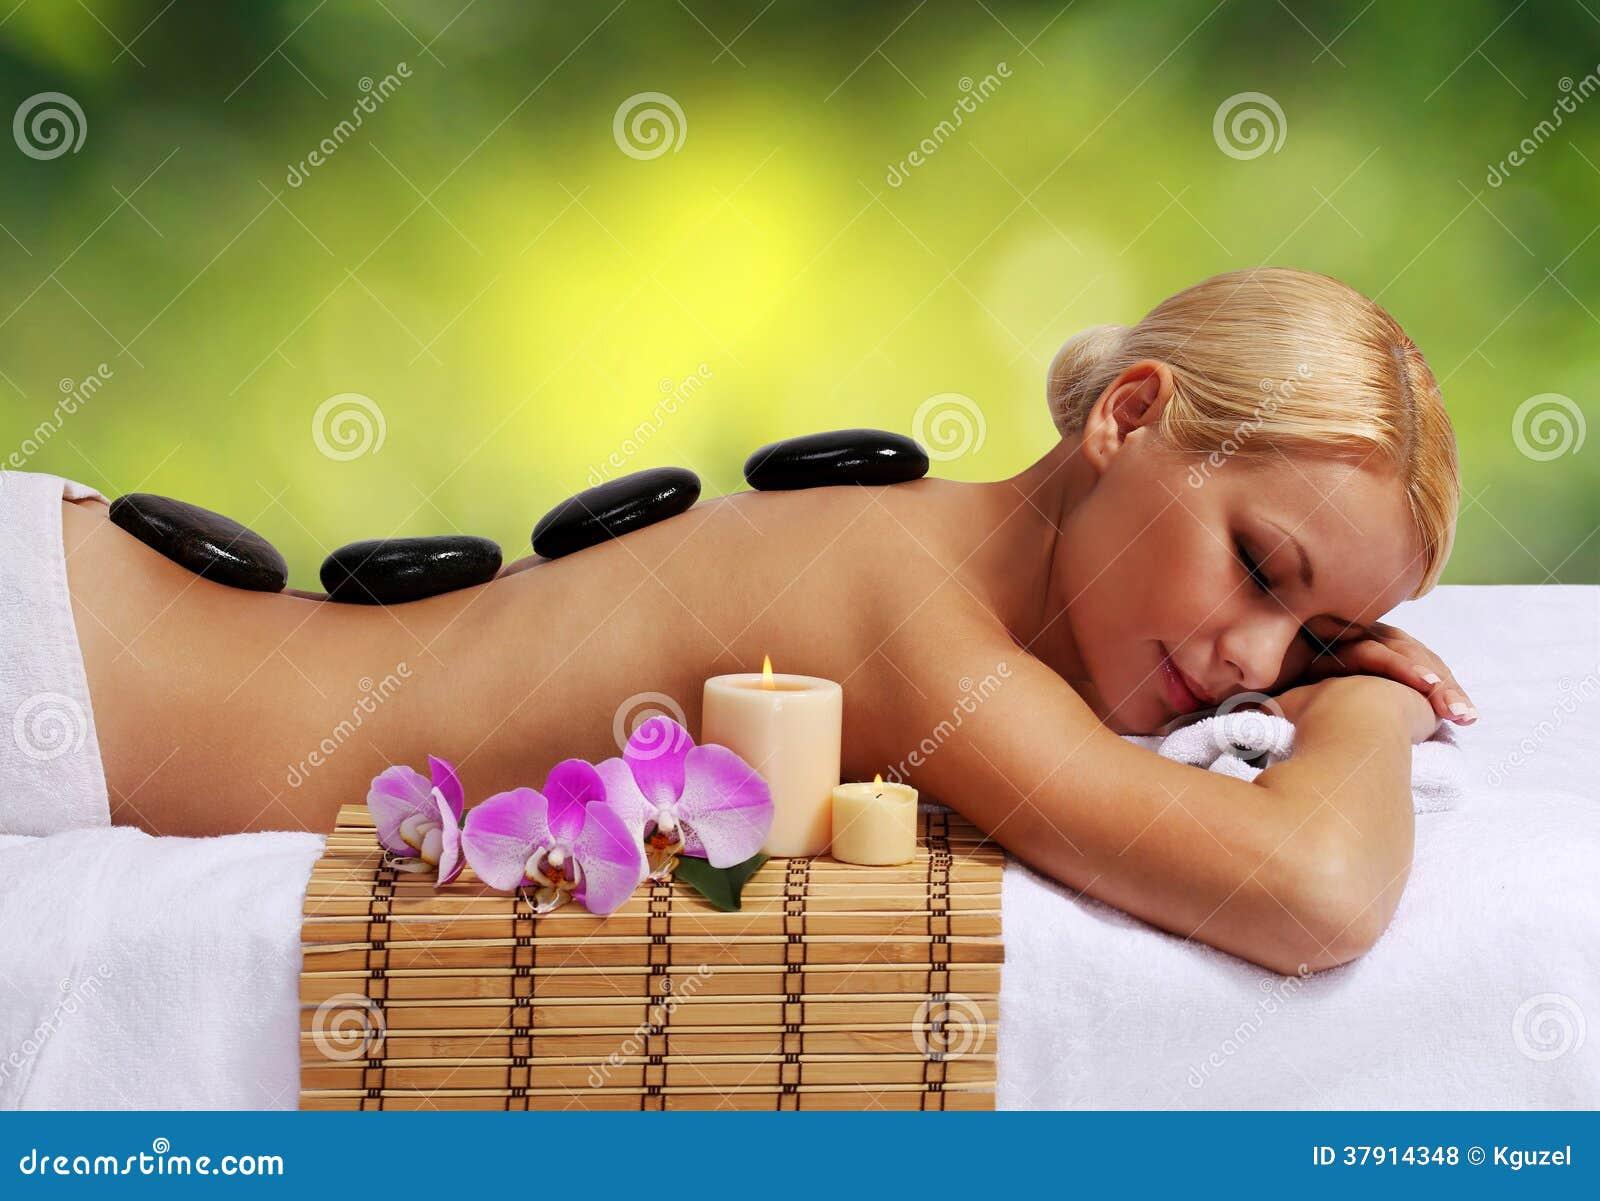 Masaje de piedra del balneario. Mujer rubia